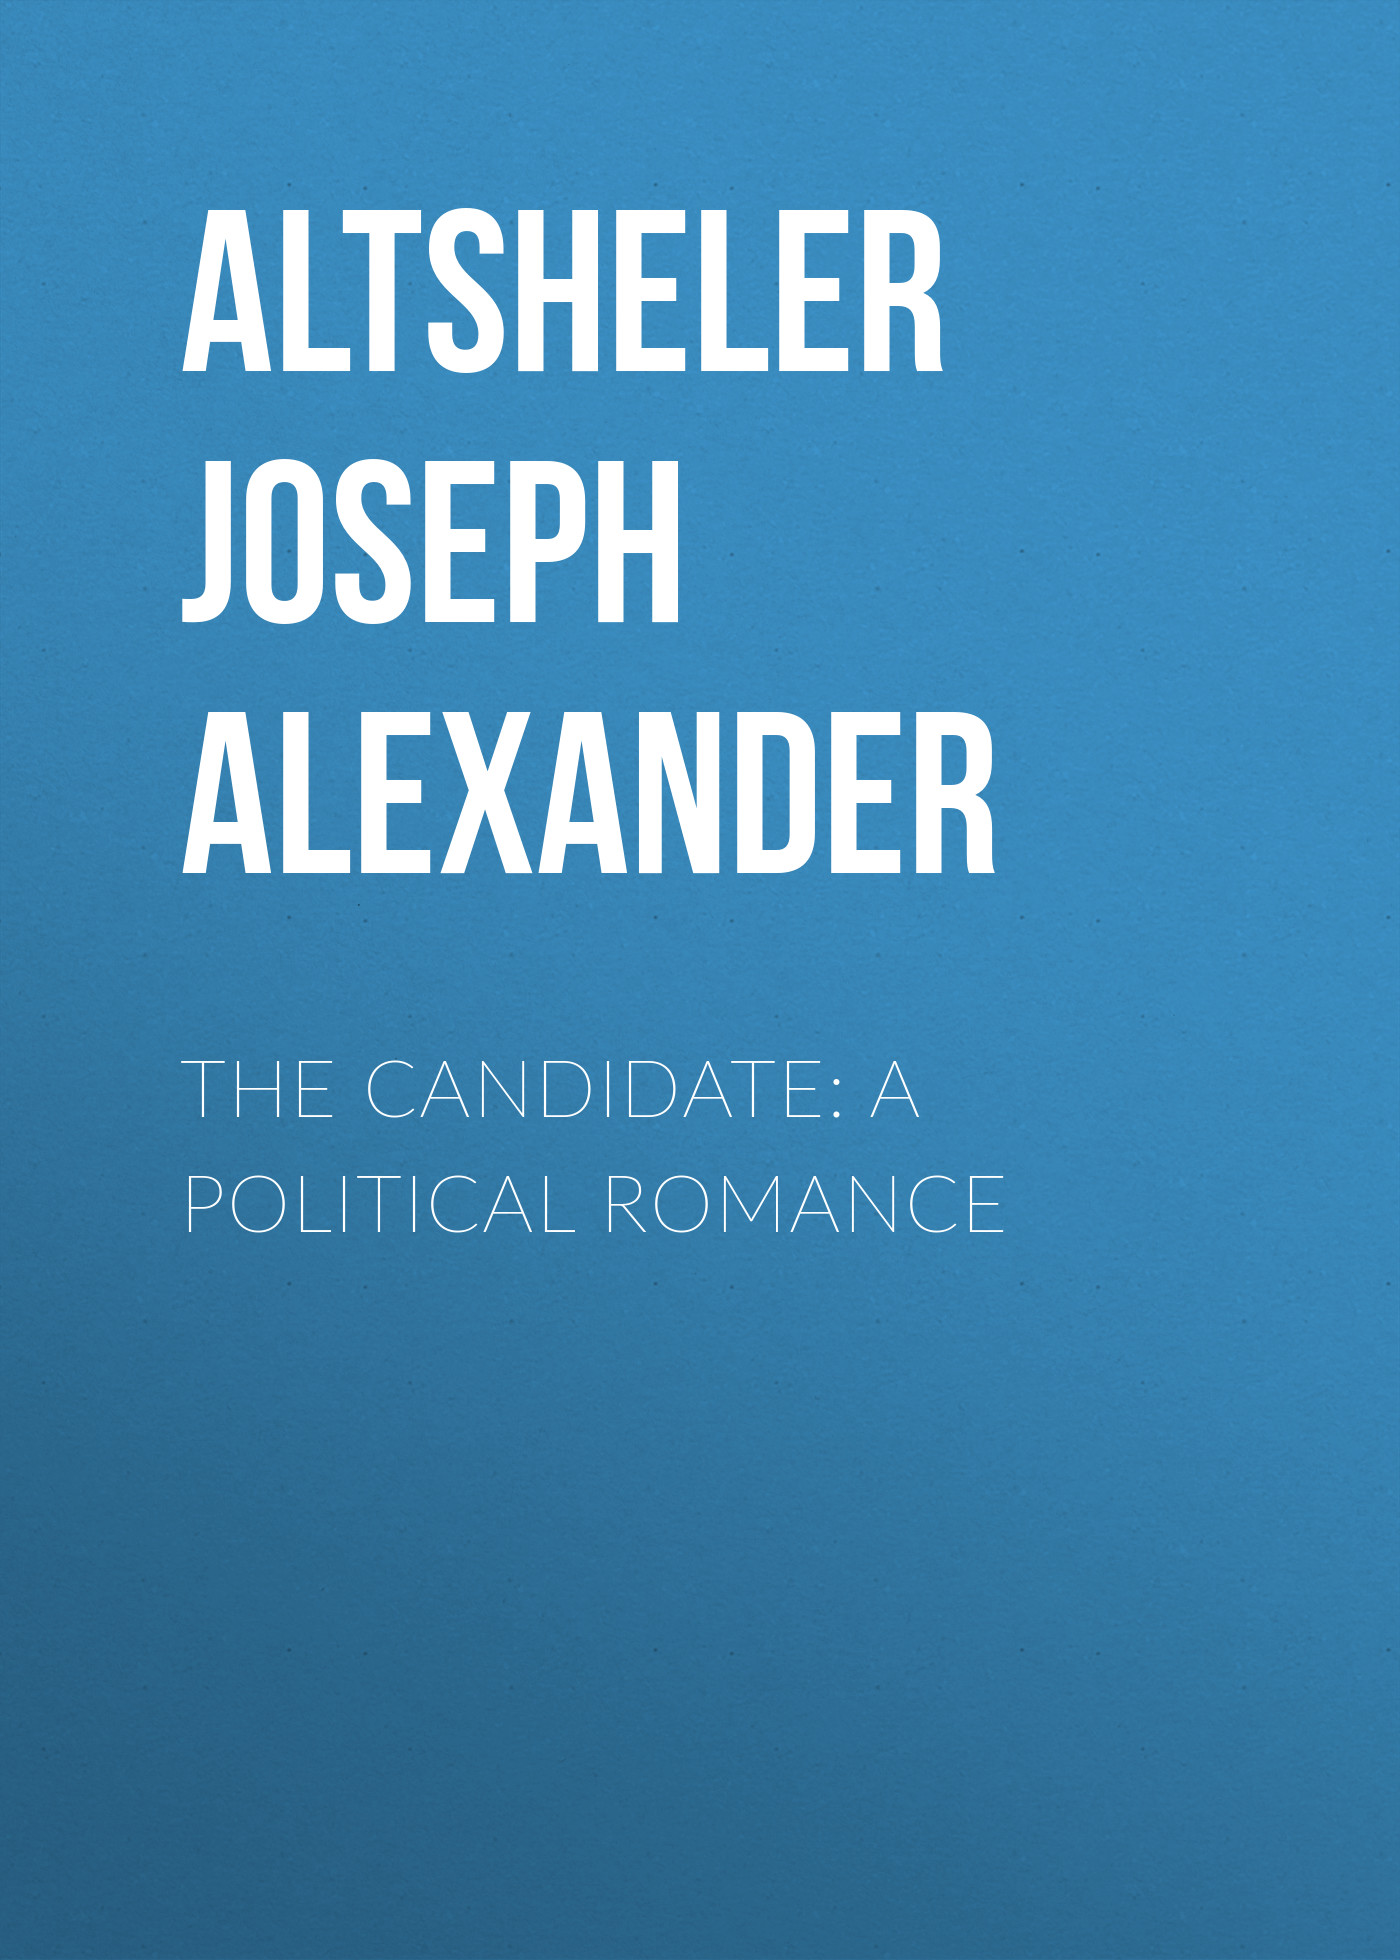 цена Altsheler Joseph Alexander The Candidate: A Political Romance